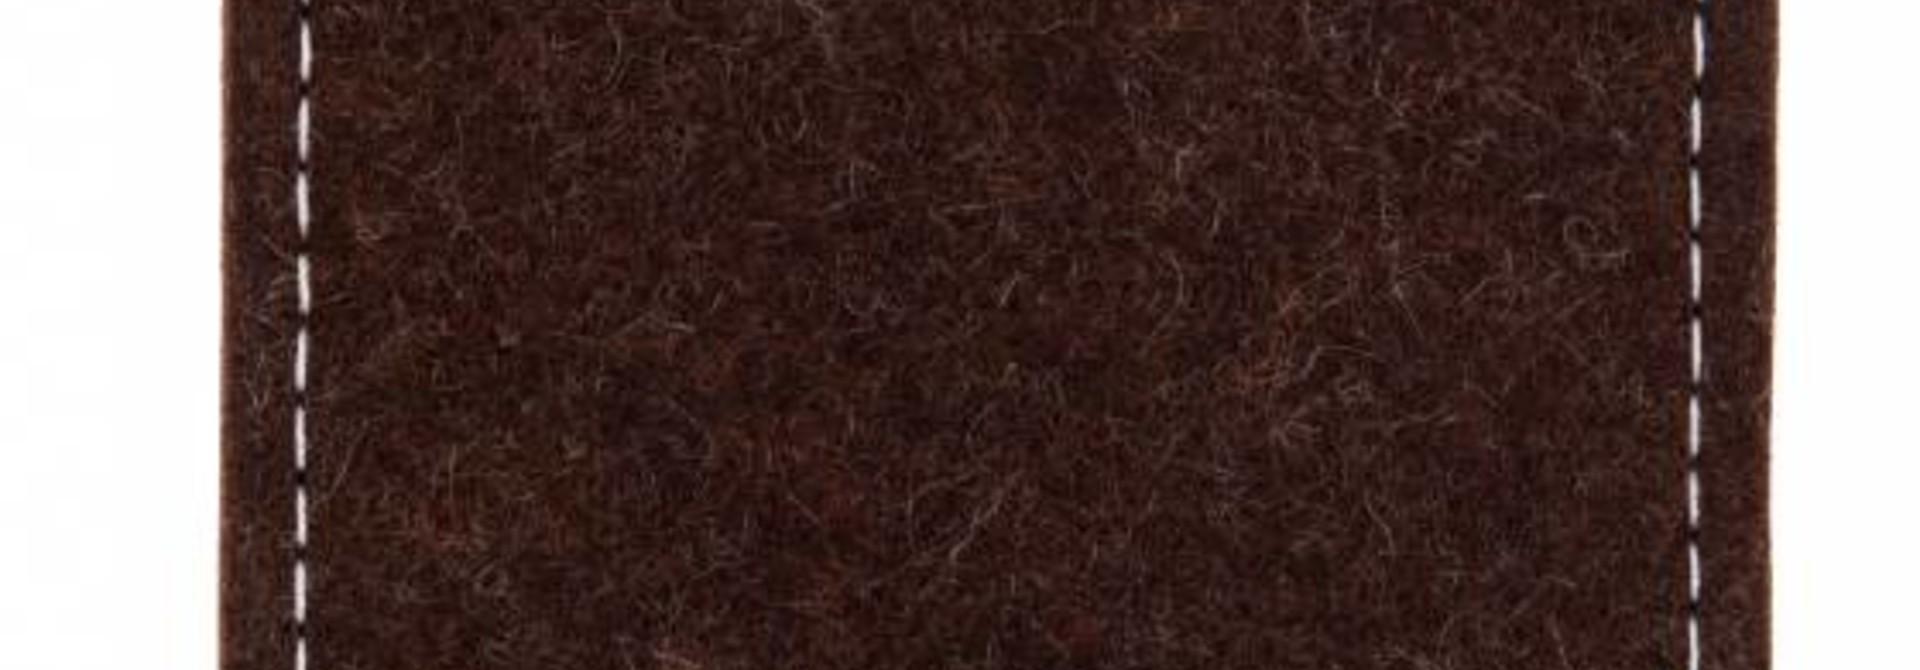 Smartphone Sleeve Truffle-Brown